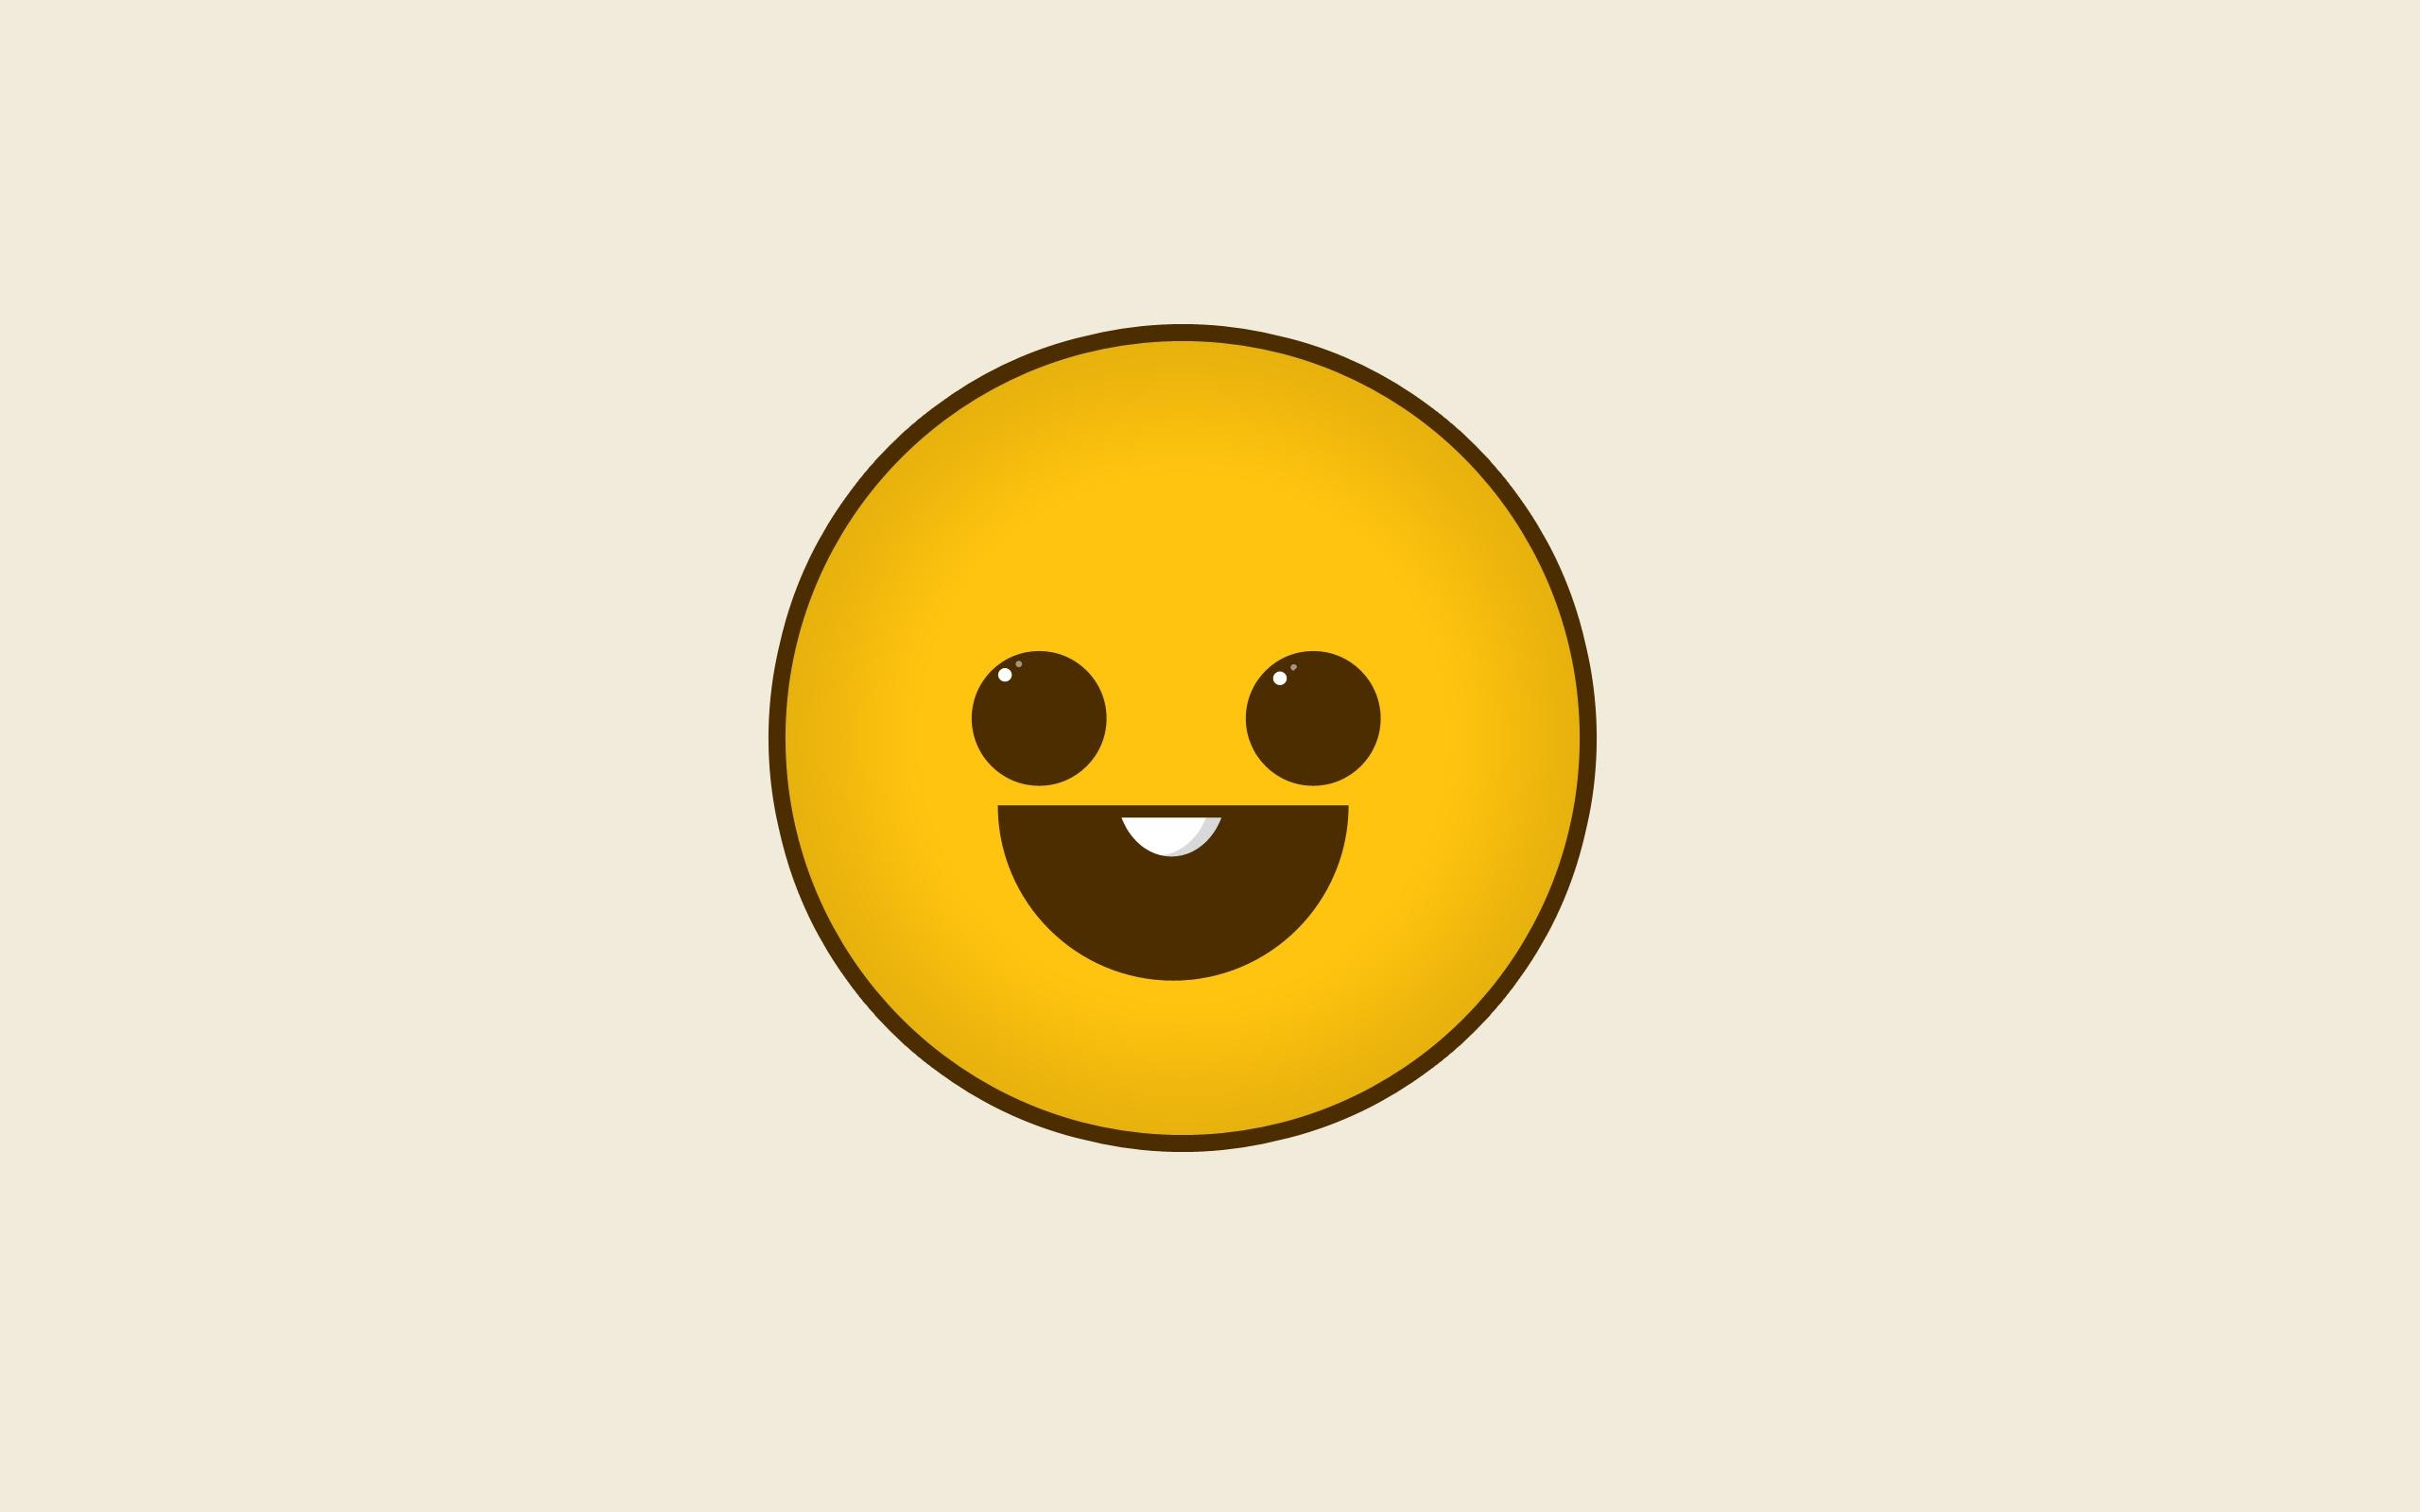 2560x1600 Download Wallpaper 2560x1600 Smile, Drawing, Emotion, Paper